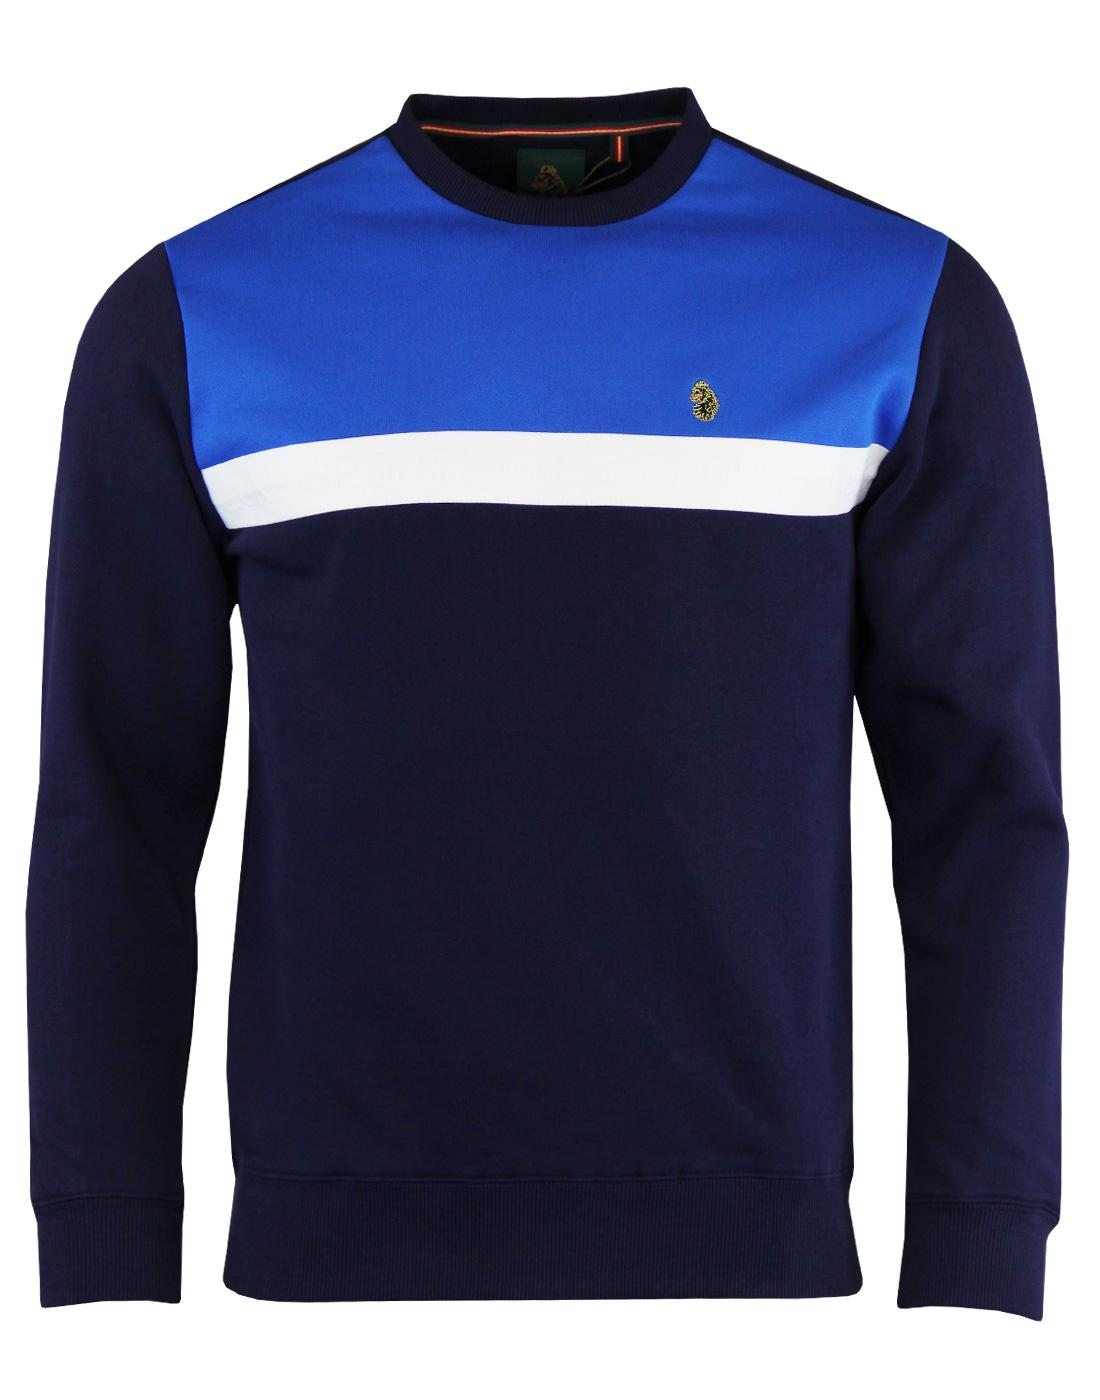 Micheal LUKE 1977 Retro Colour Block Sweatshirt